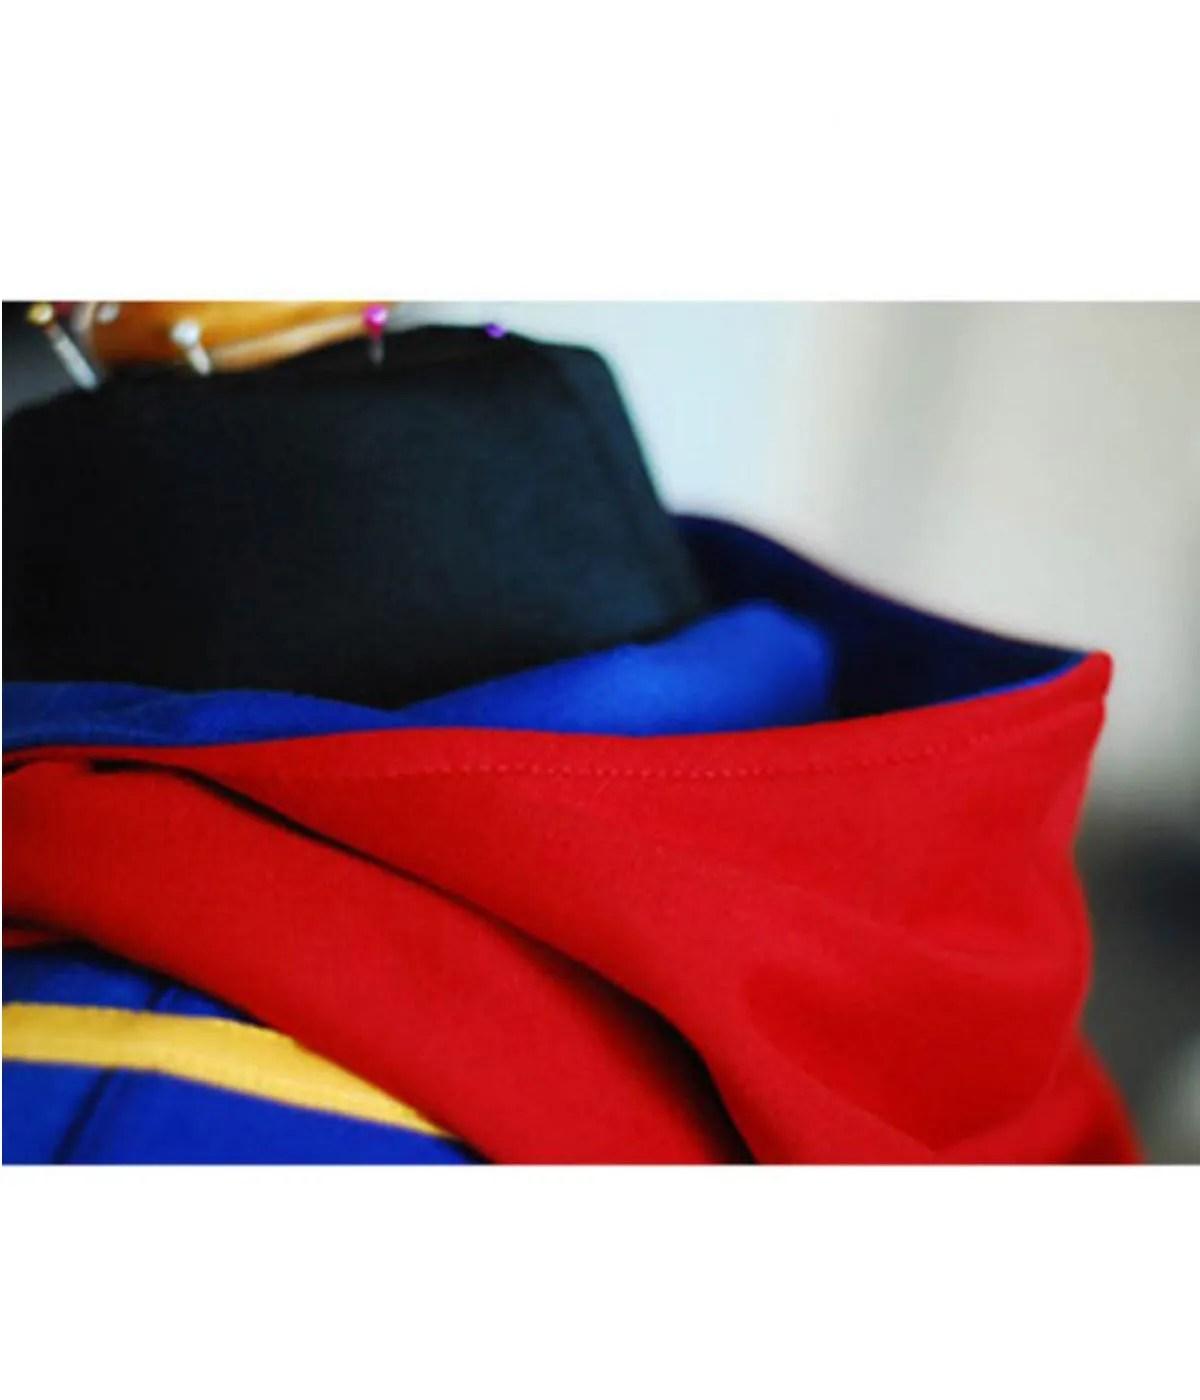 ms-marvel-kamala-khan-hoodie